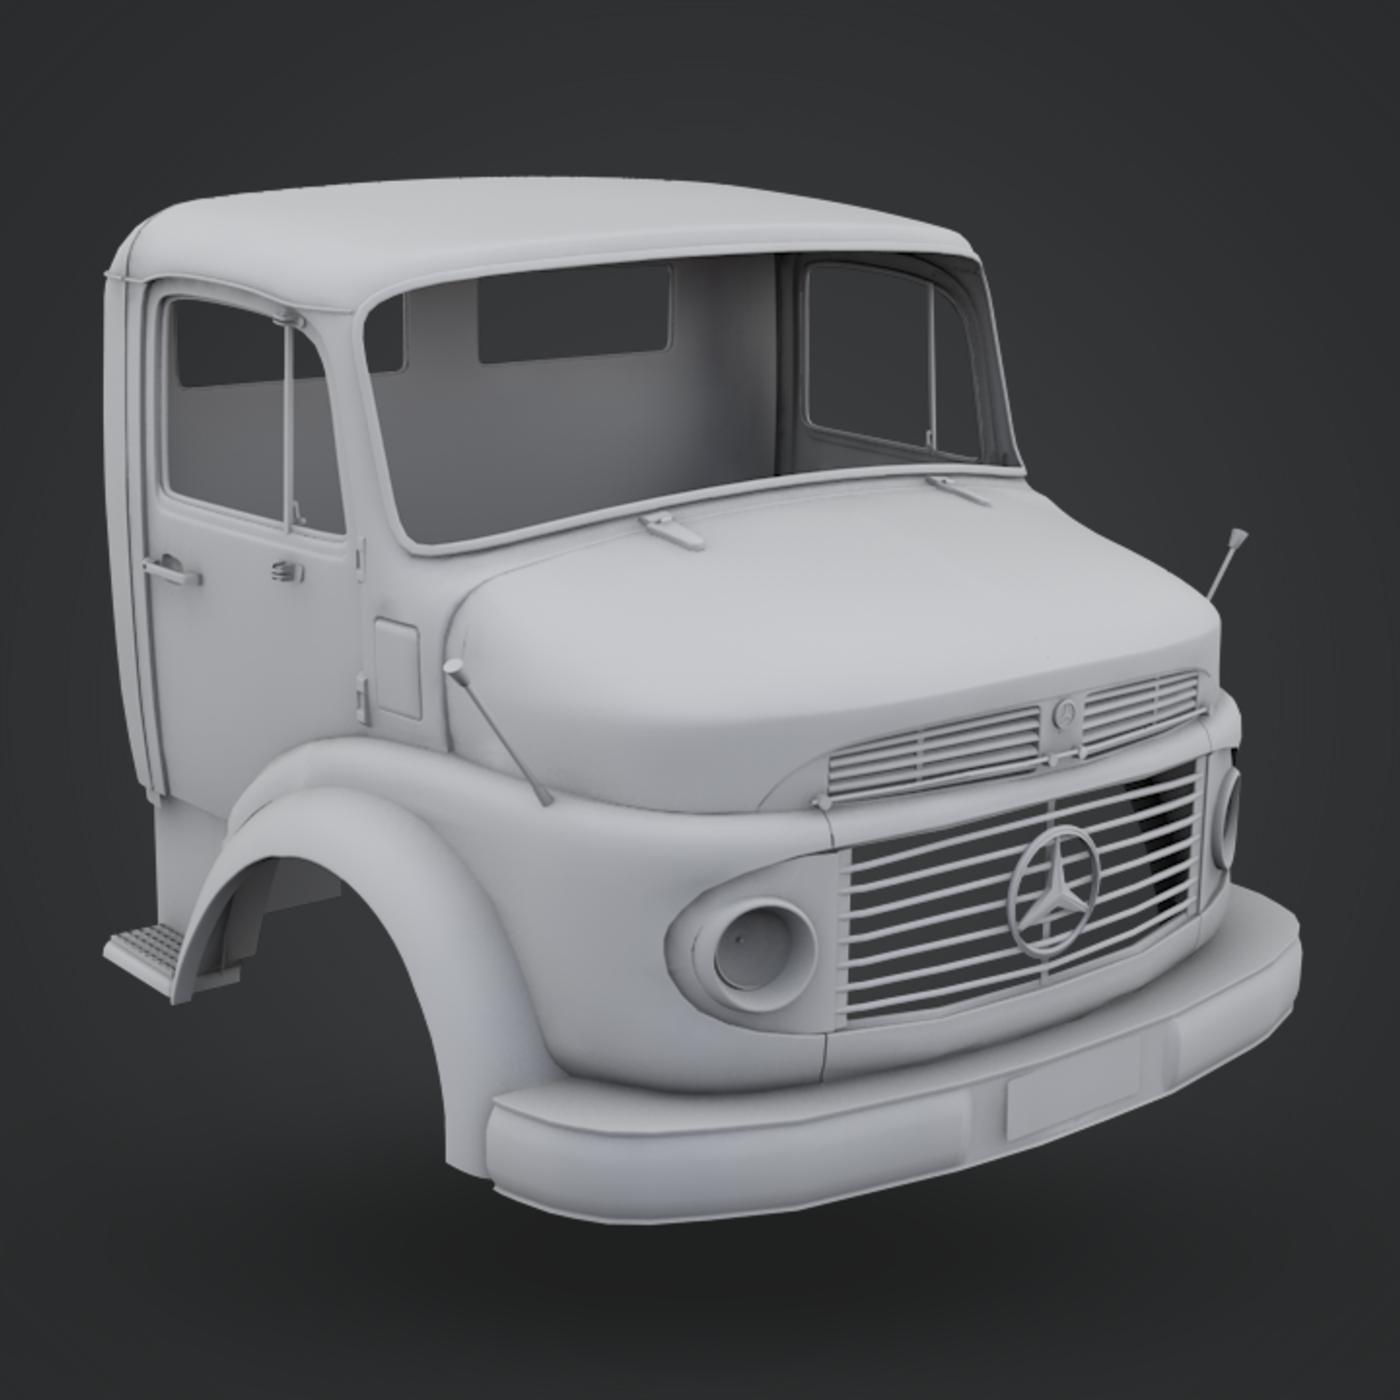 Mercedes-Benz Truck 1924-2624 Cabin